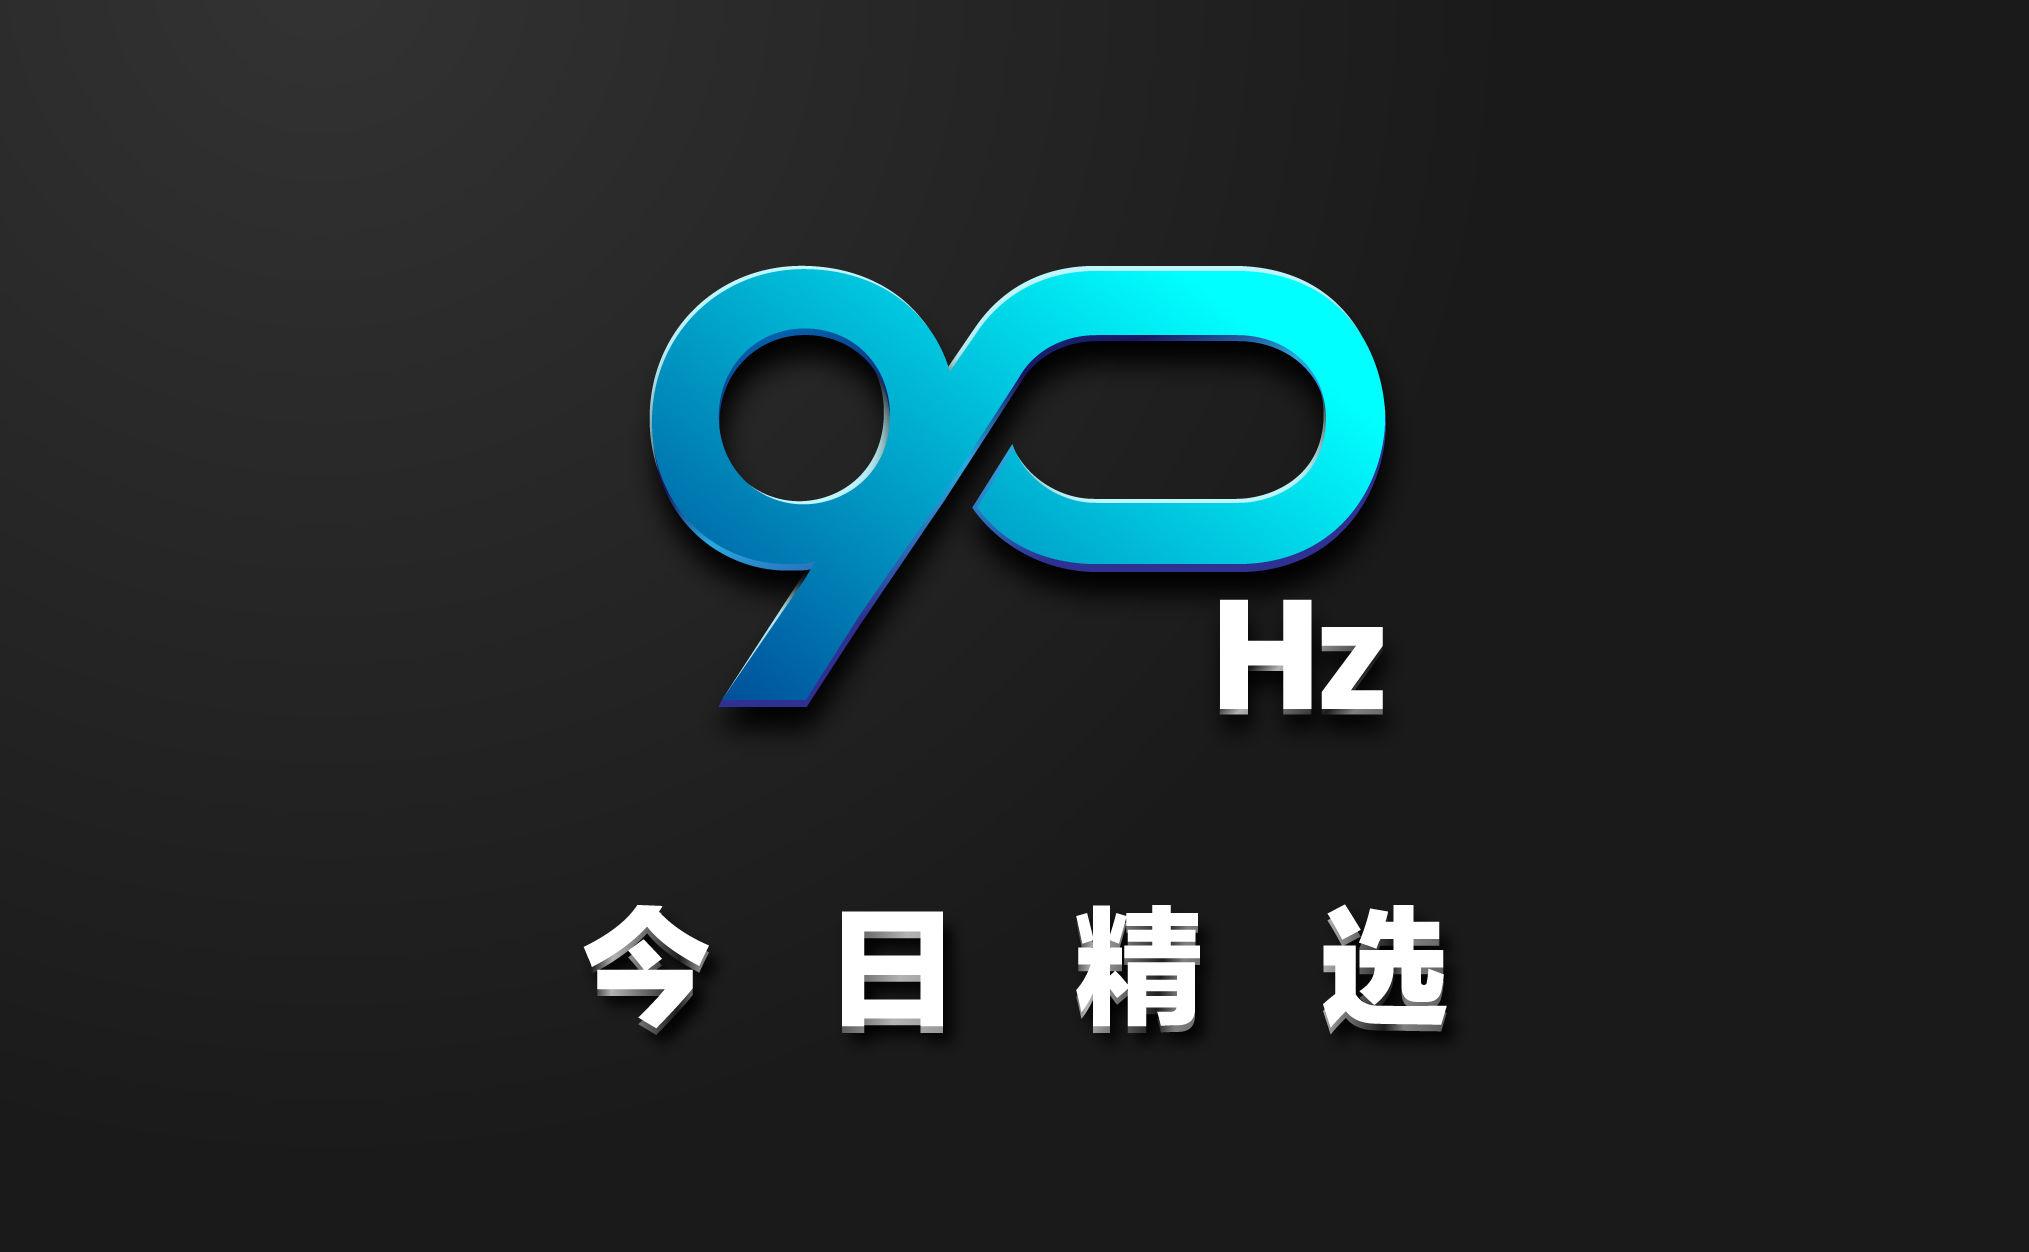 90Hz 今日精选:最好的 VR 射击游戏将于 7 月上线